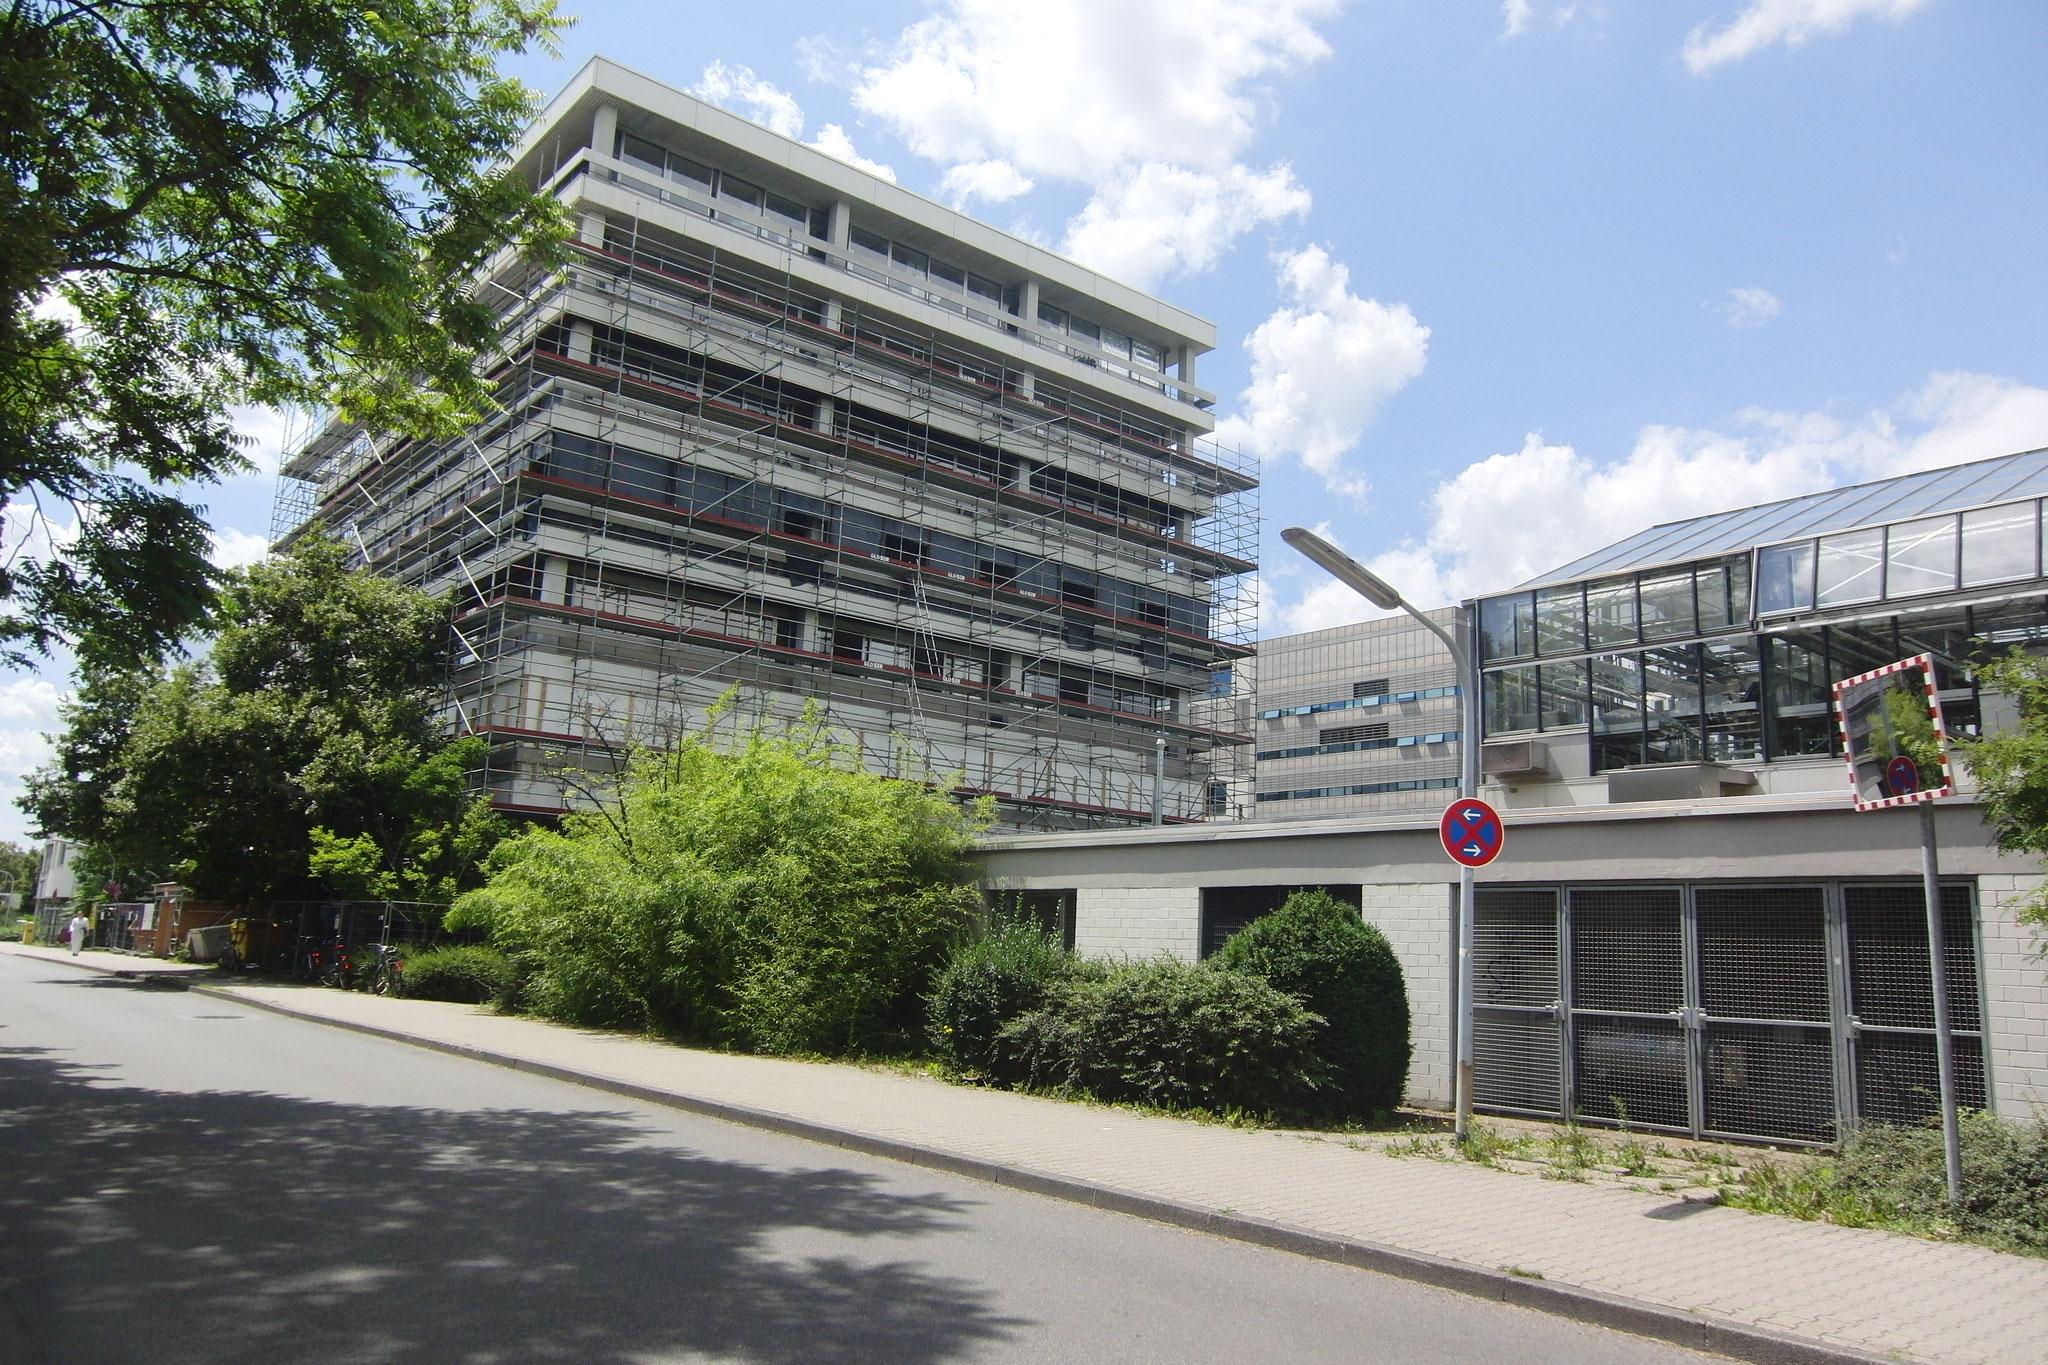 Zoologisches Institut Universität Heidelberg